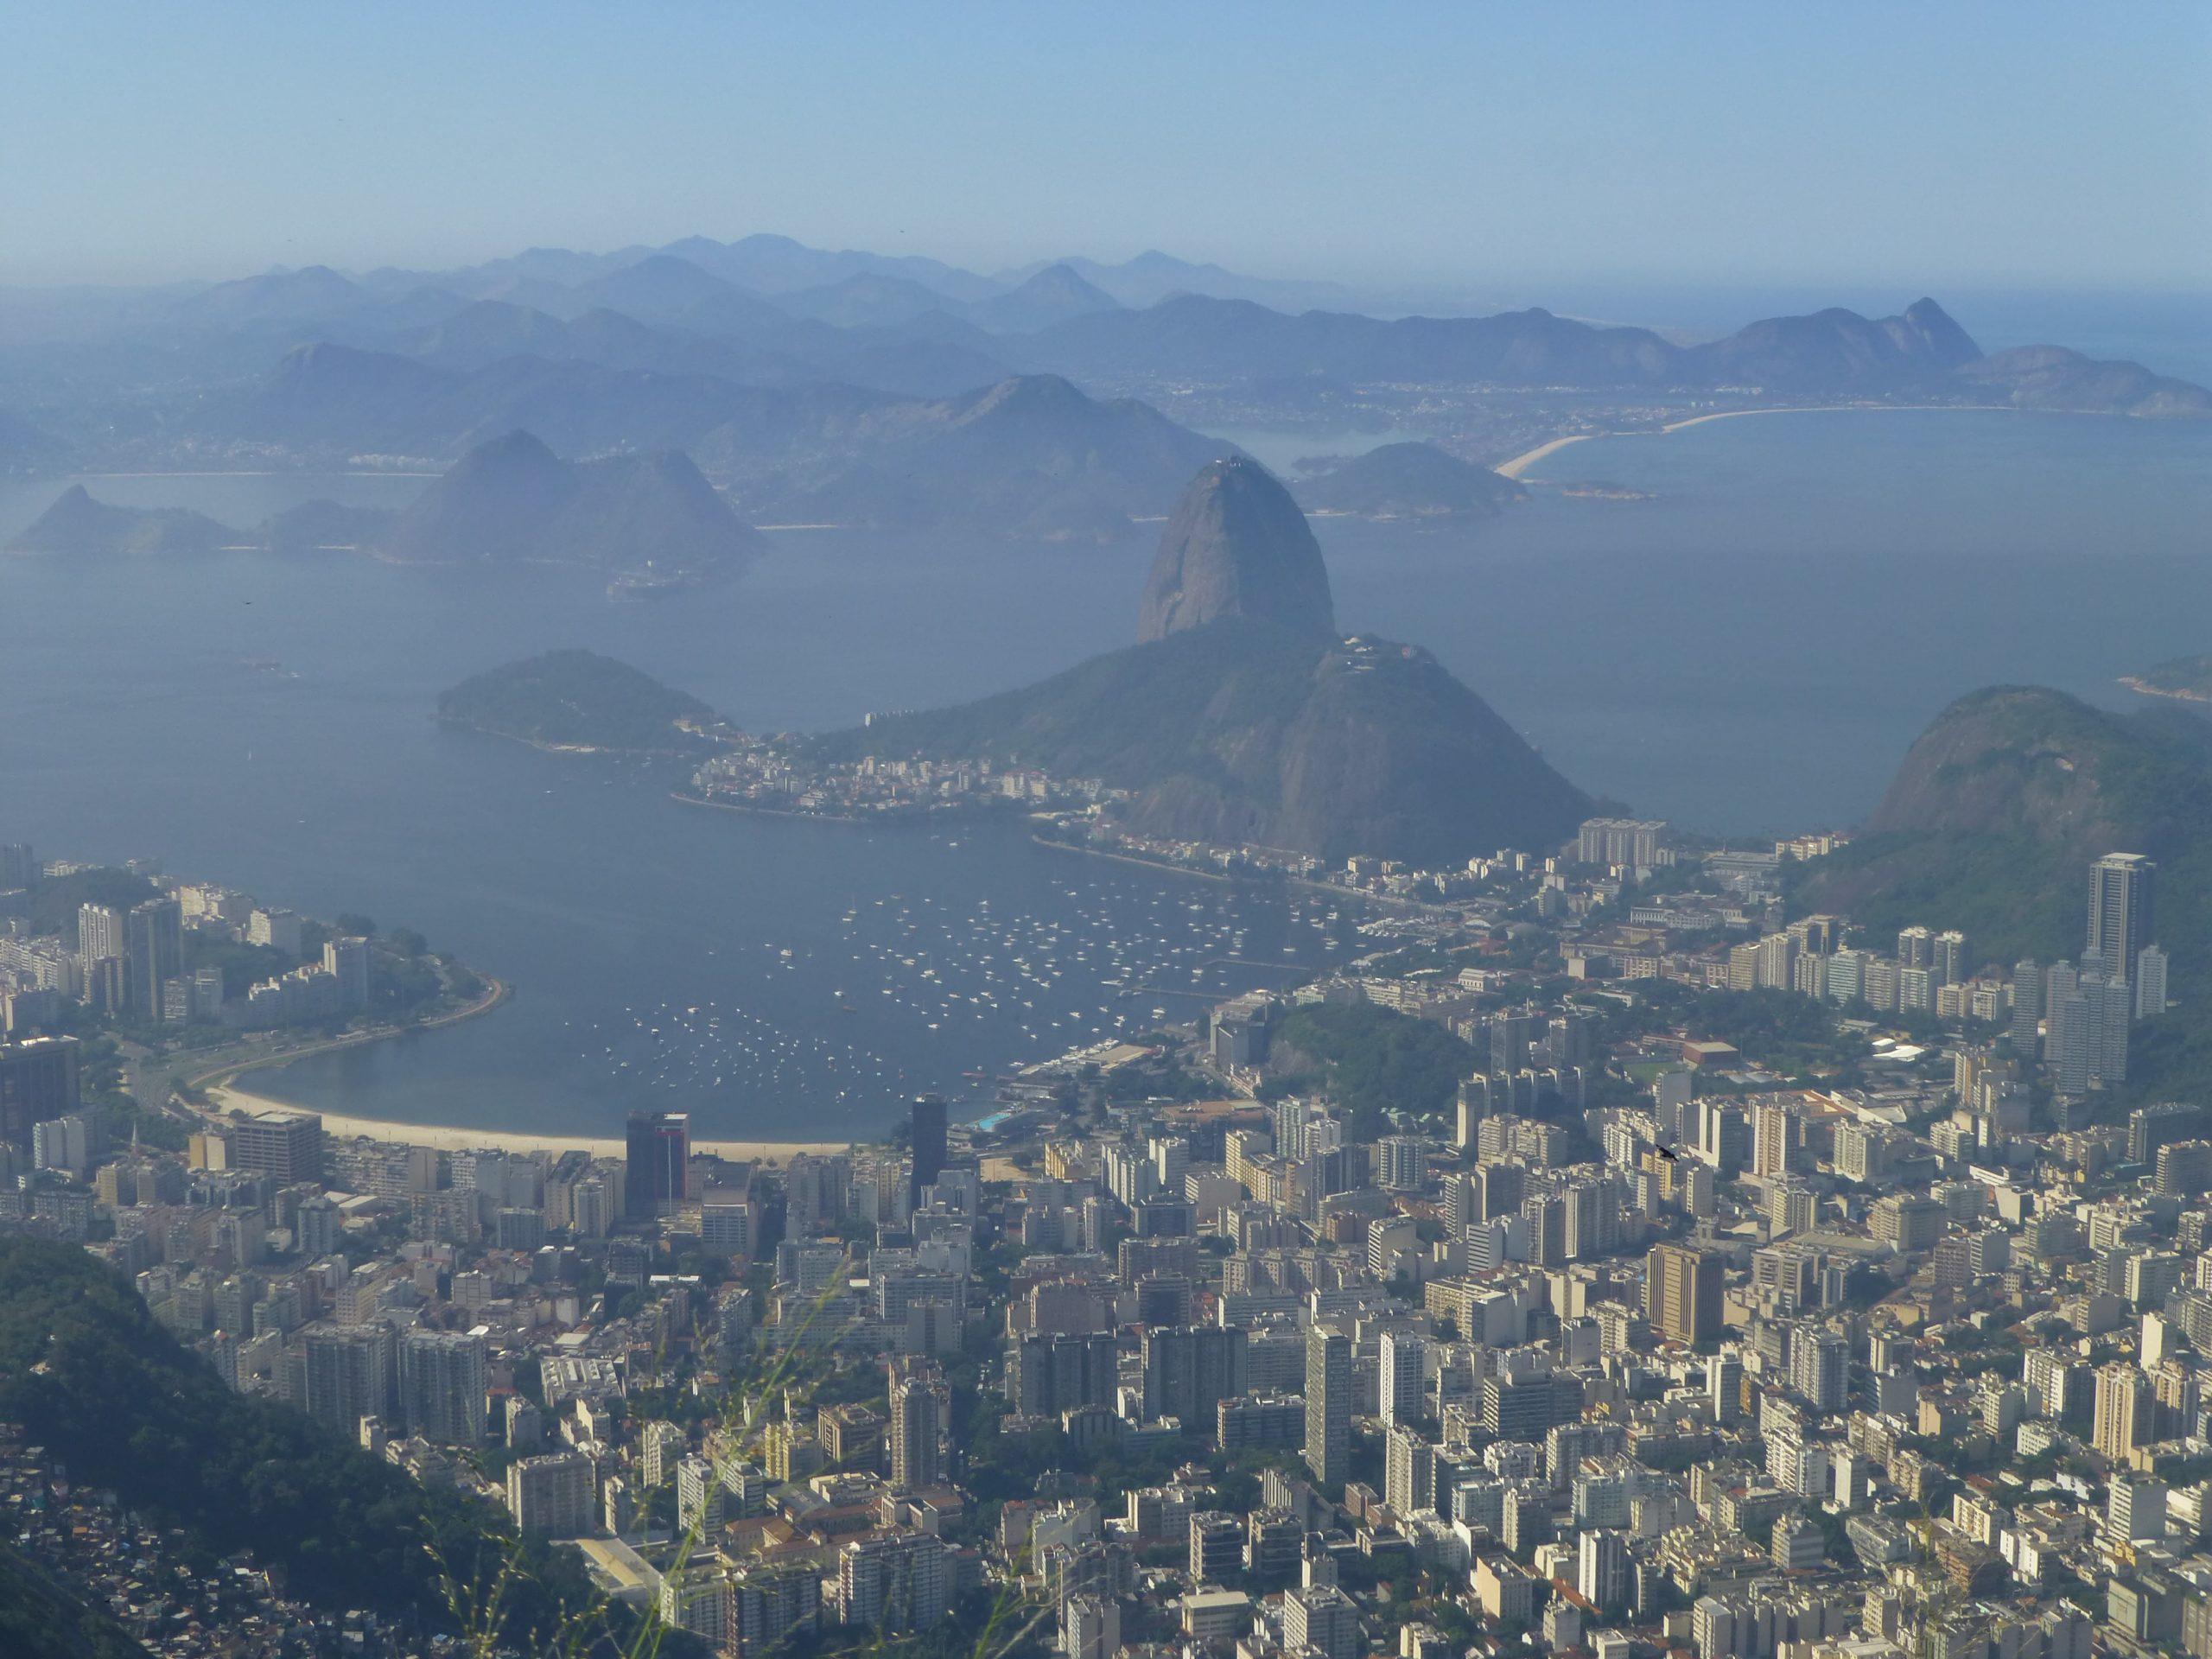 Rio de Janeiro – Brazil